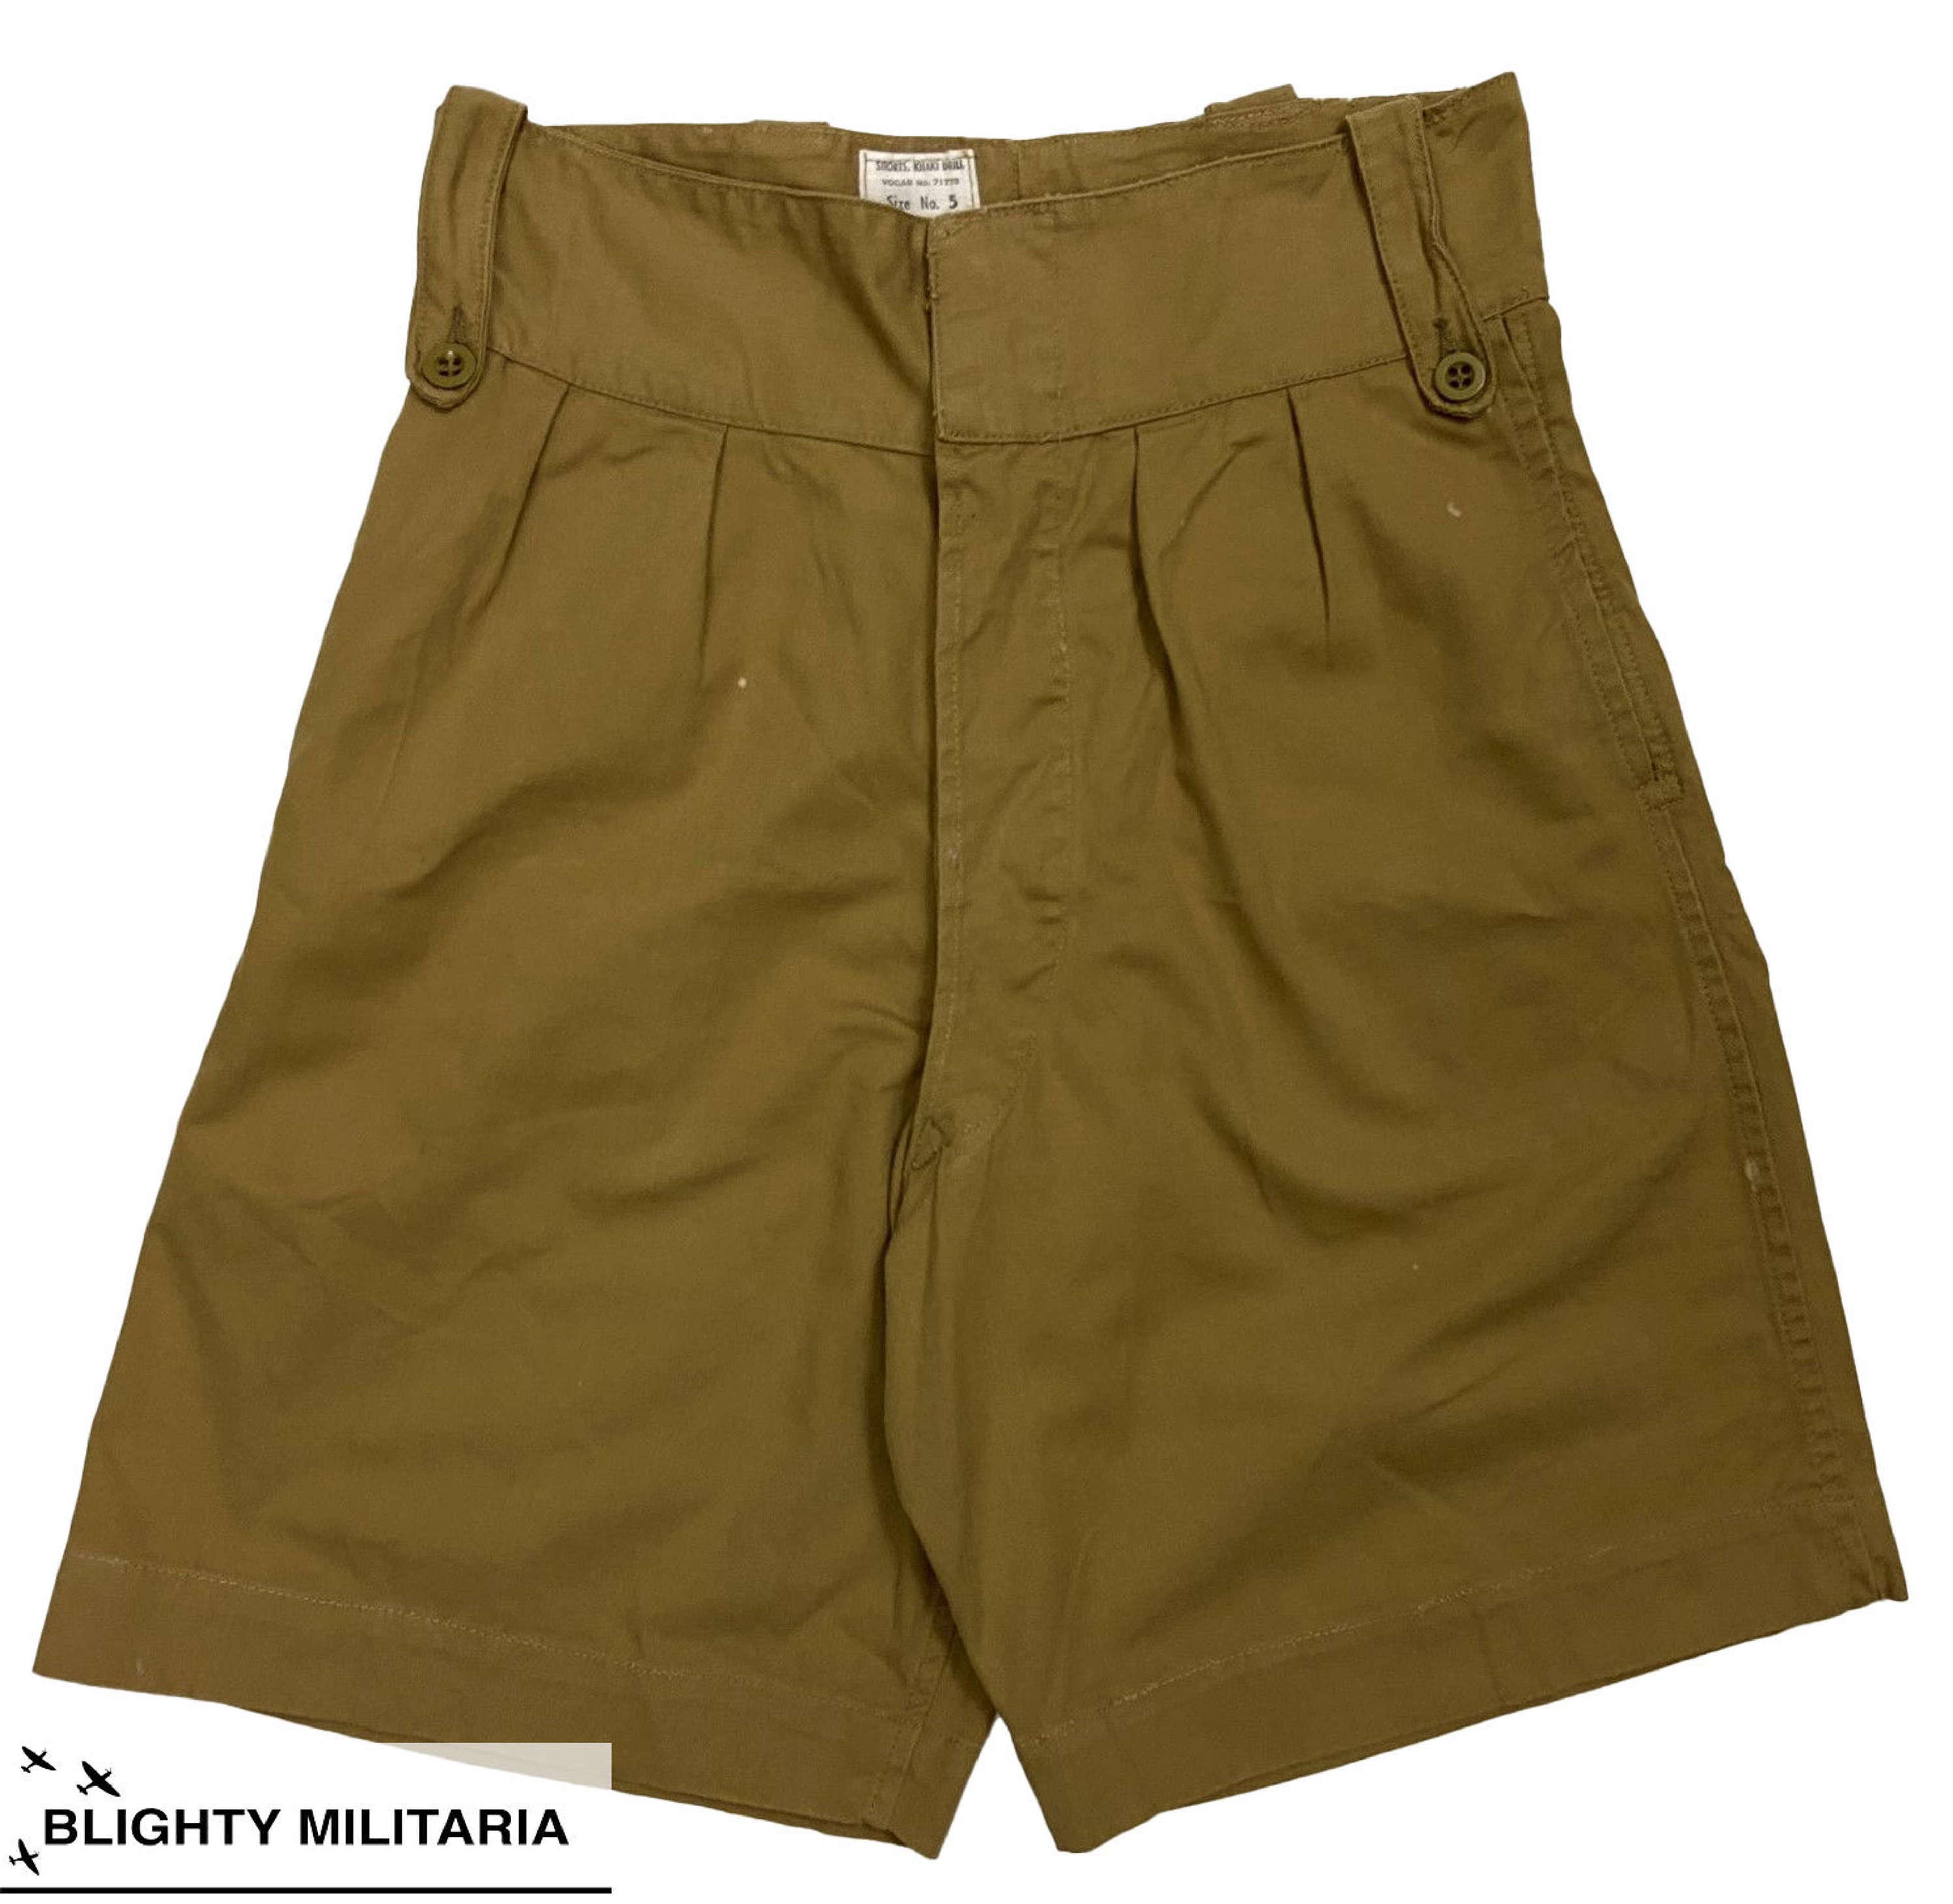 Original 1950s Royal Marines Khaki Drill Shorts - Size 30